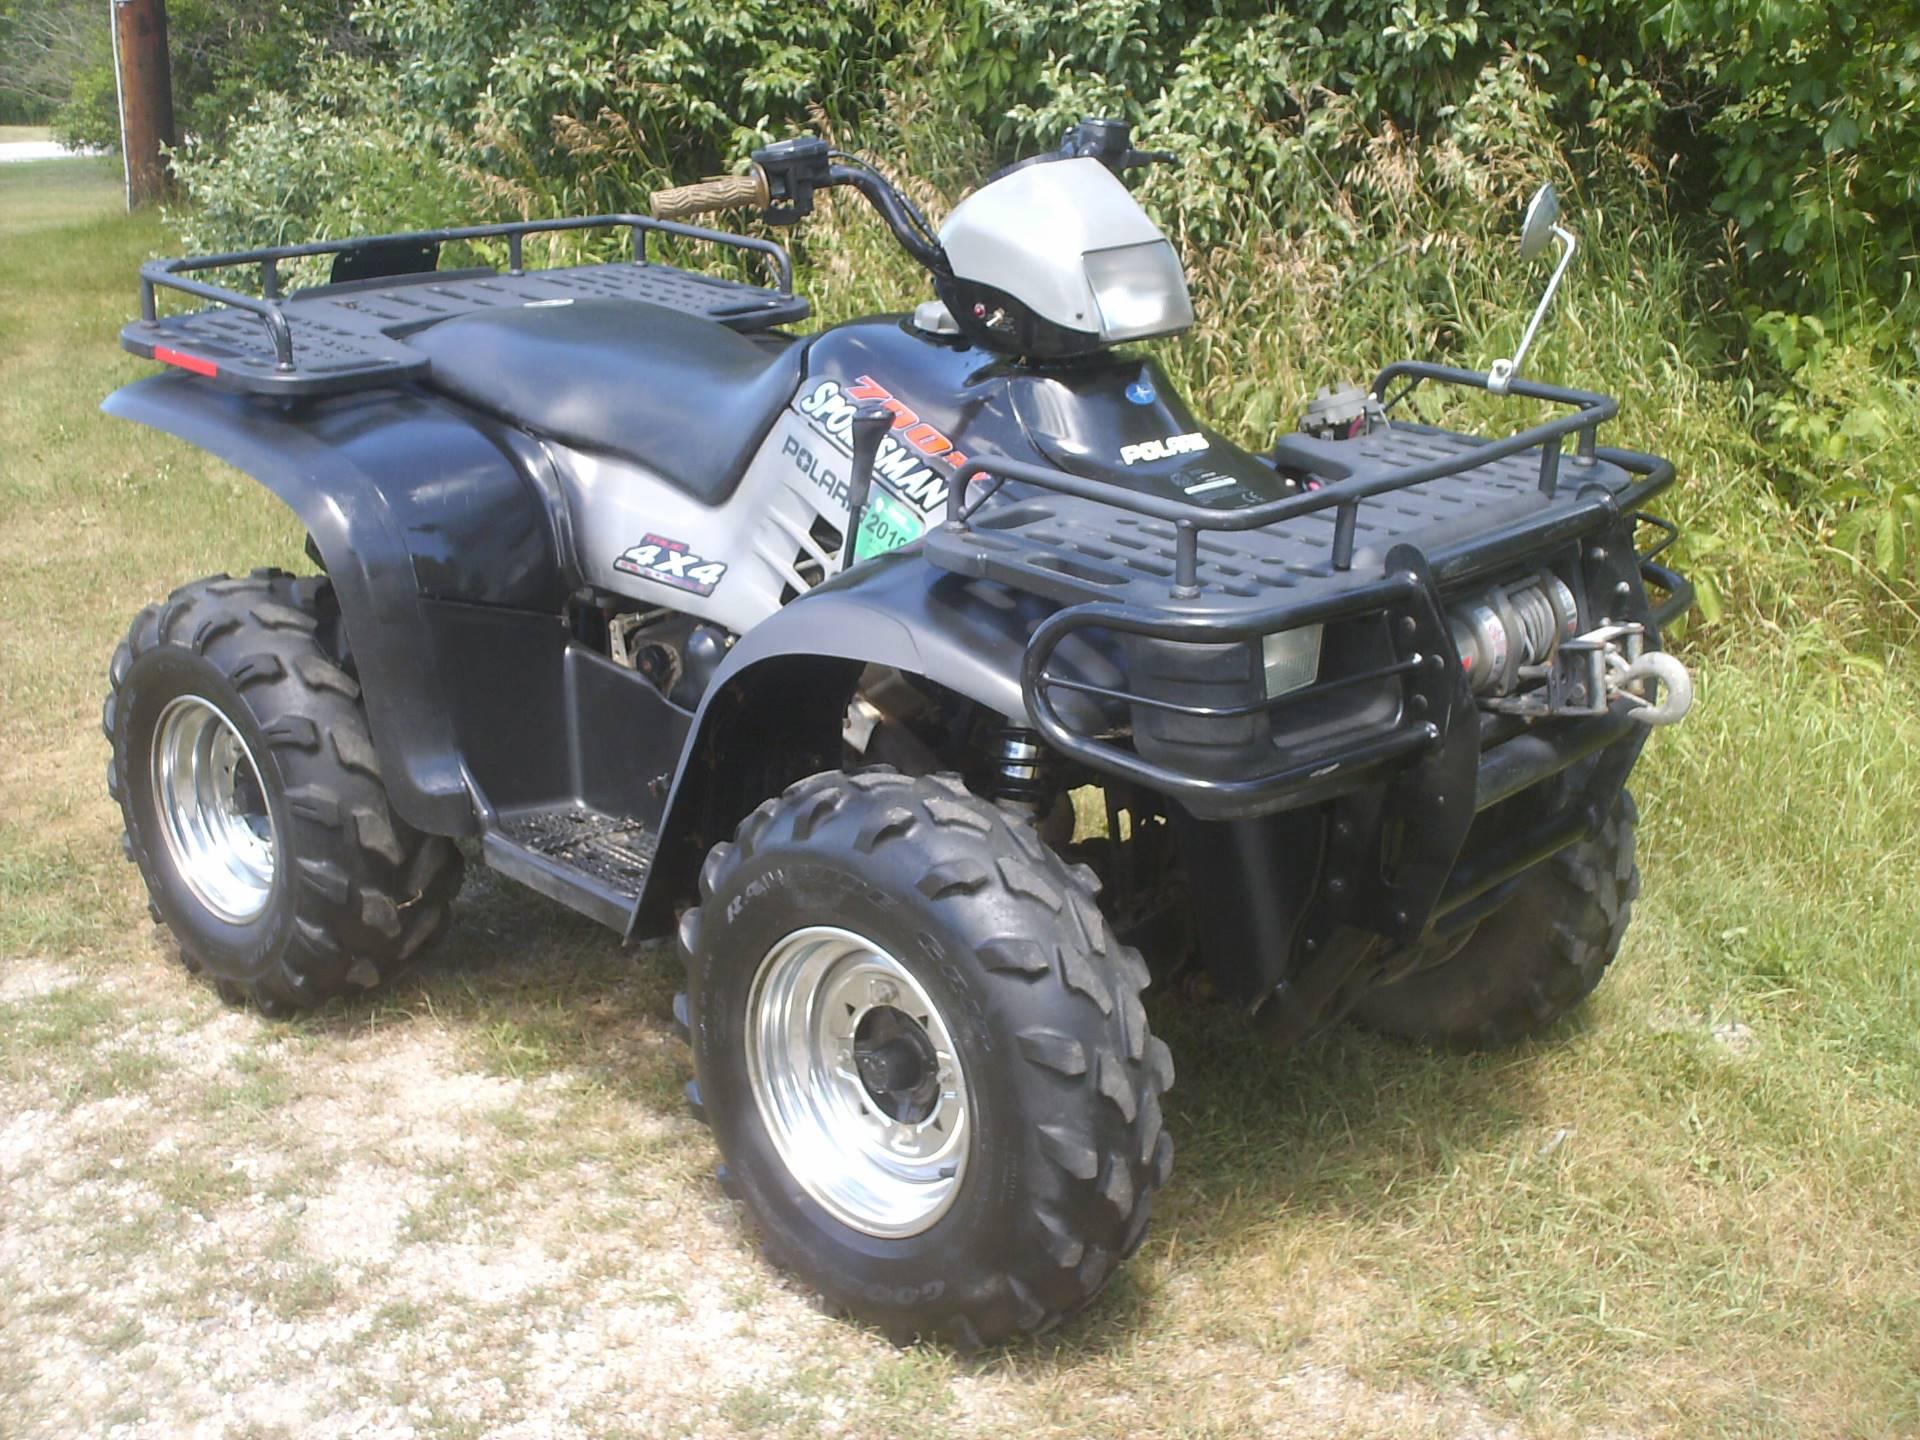 Used 2002 Polaris Sportsman 700 Twin ATVs in Mukwonago WI